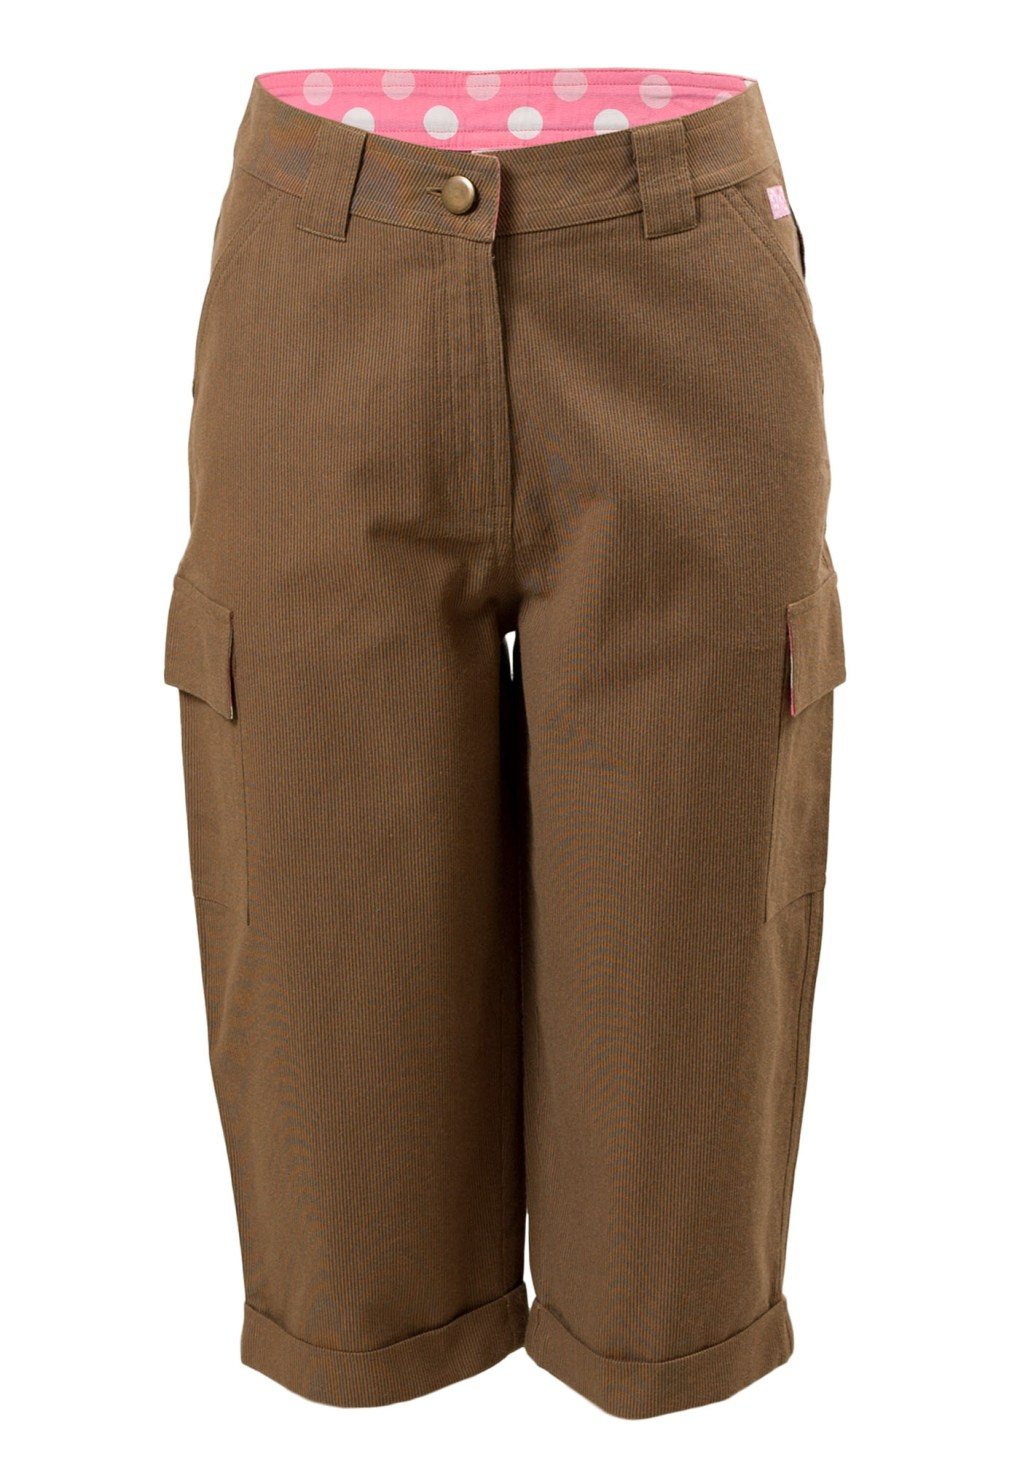 MINC Petite Nutmeg Girls Long Shorts in Brown Ribbed Cotton Cord